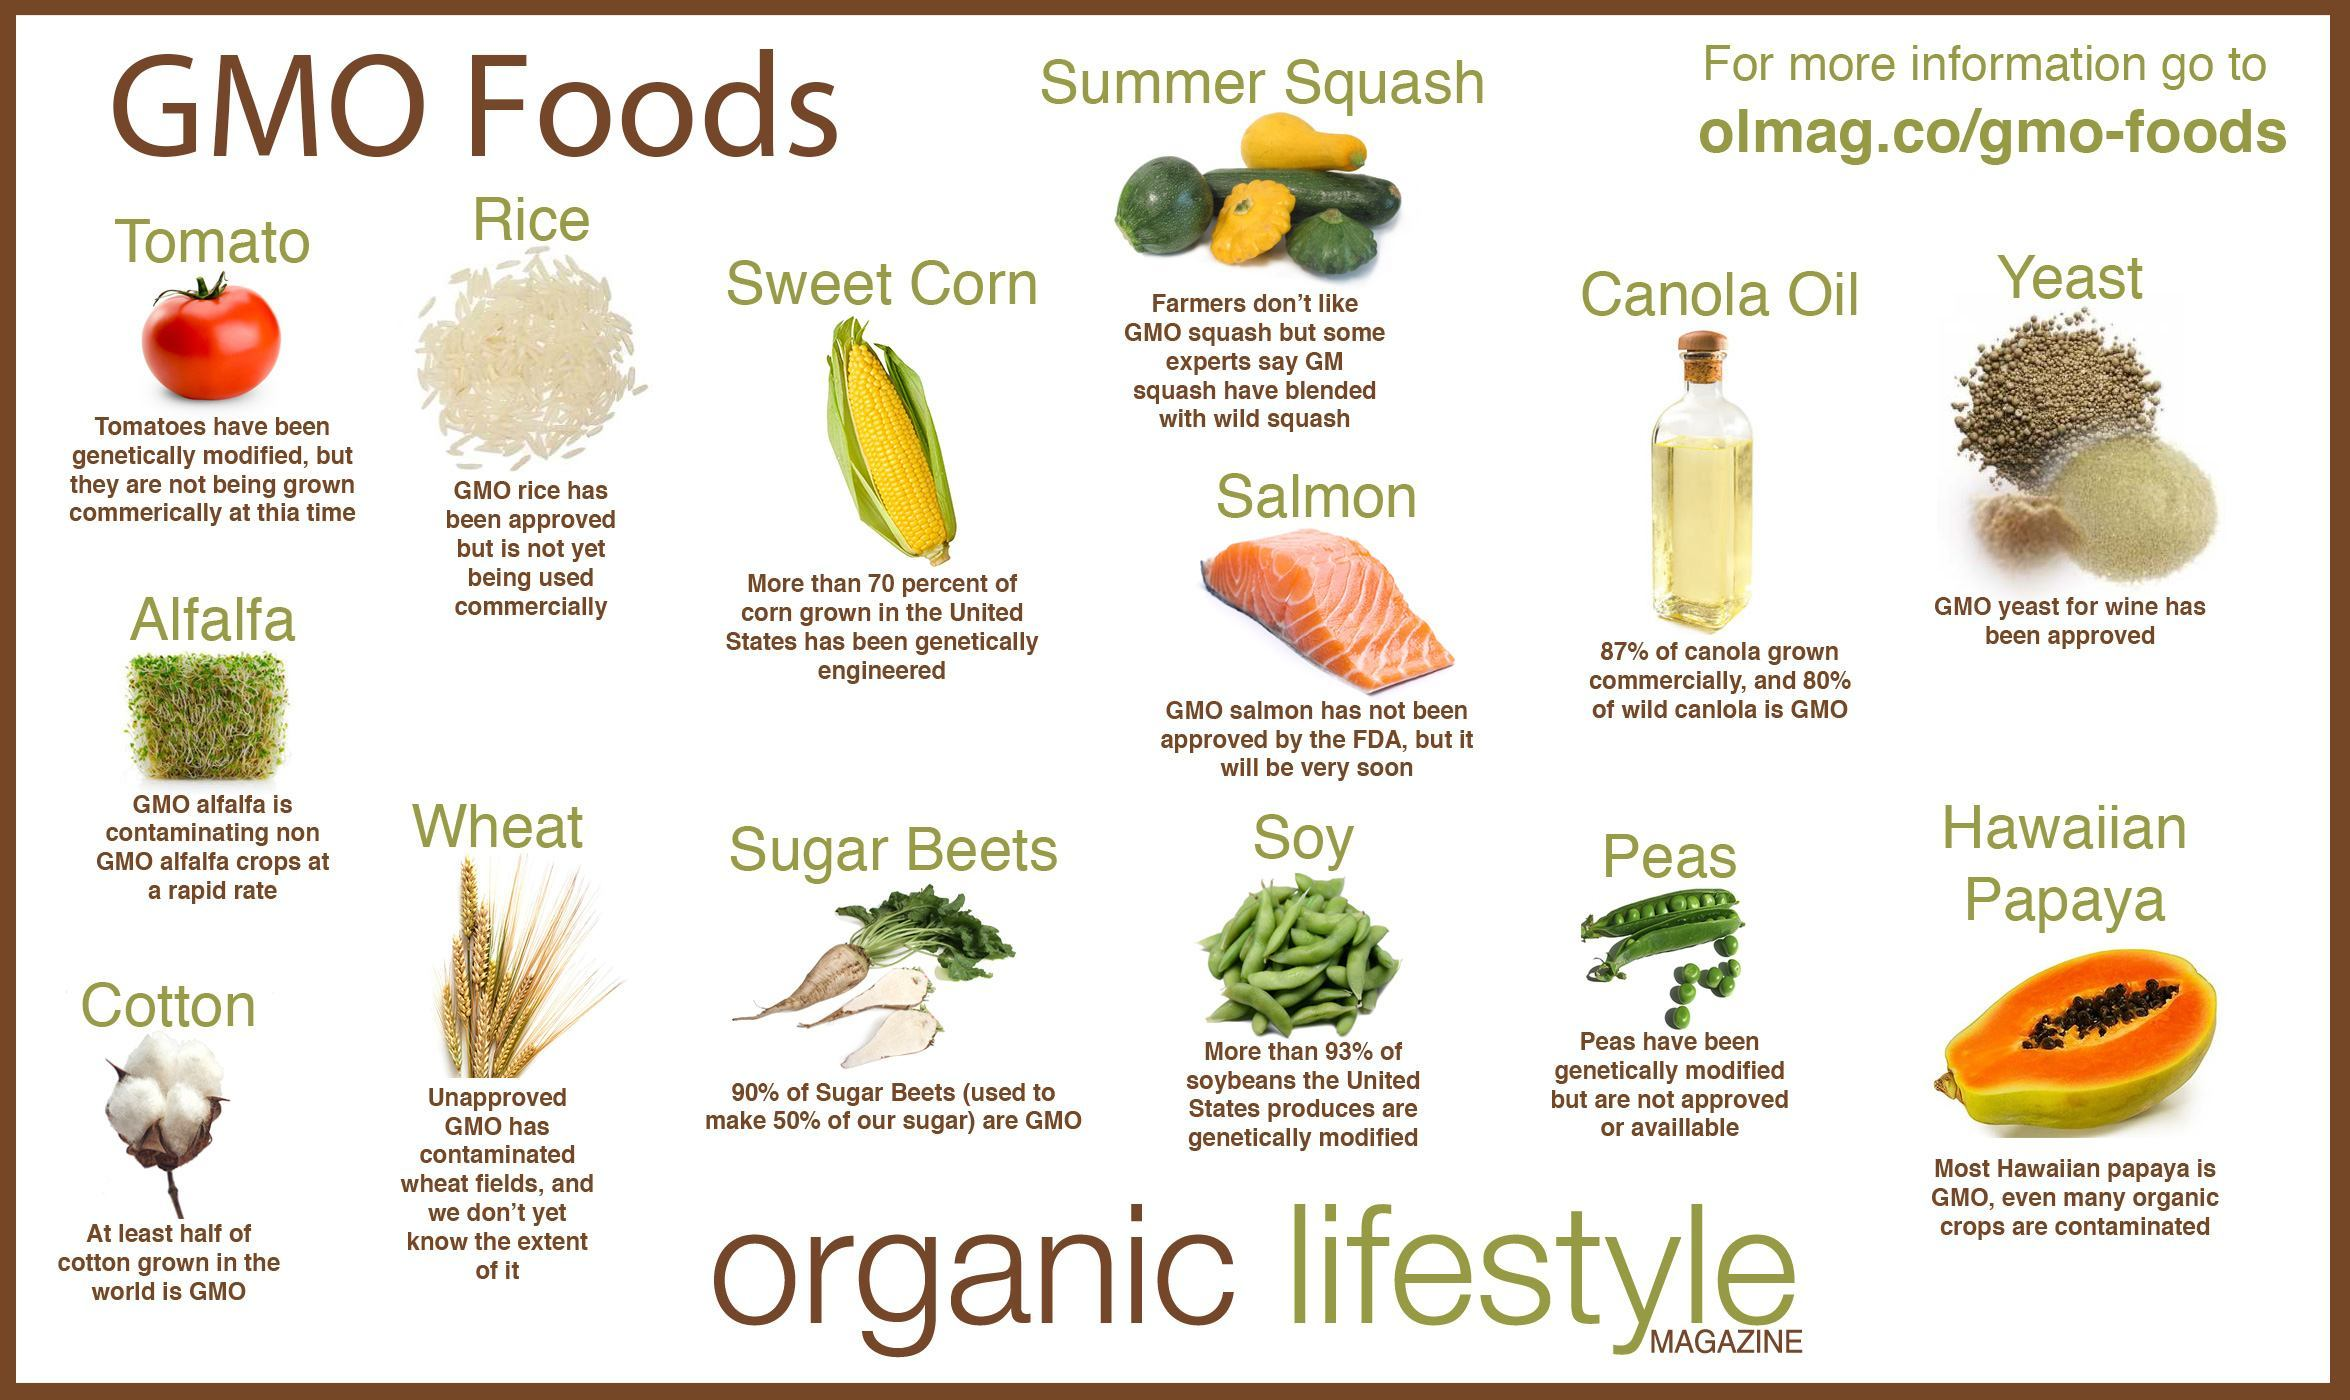 gmo-Foods-Infographic